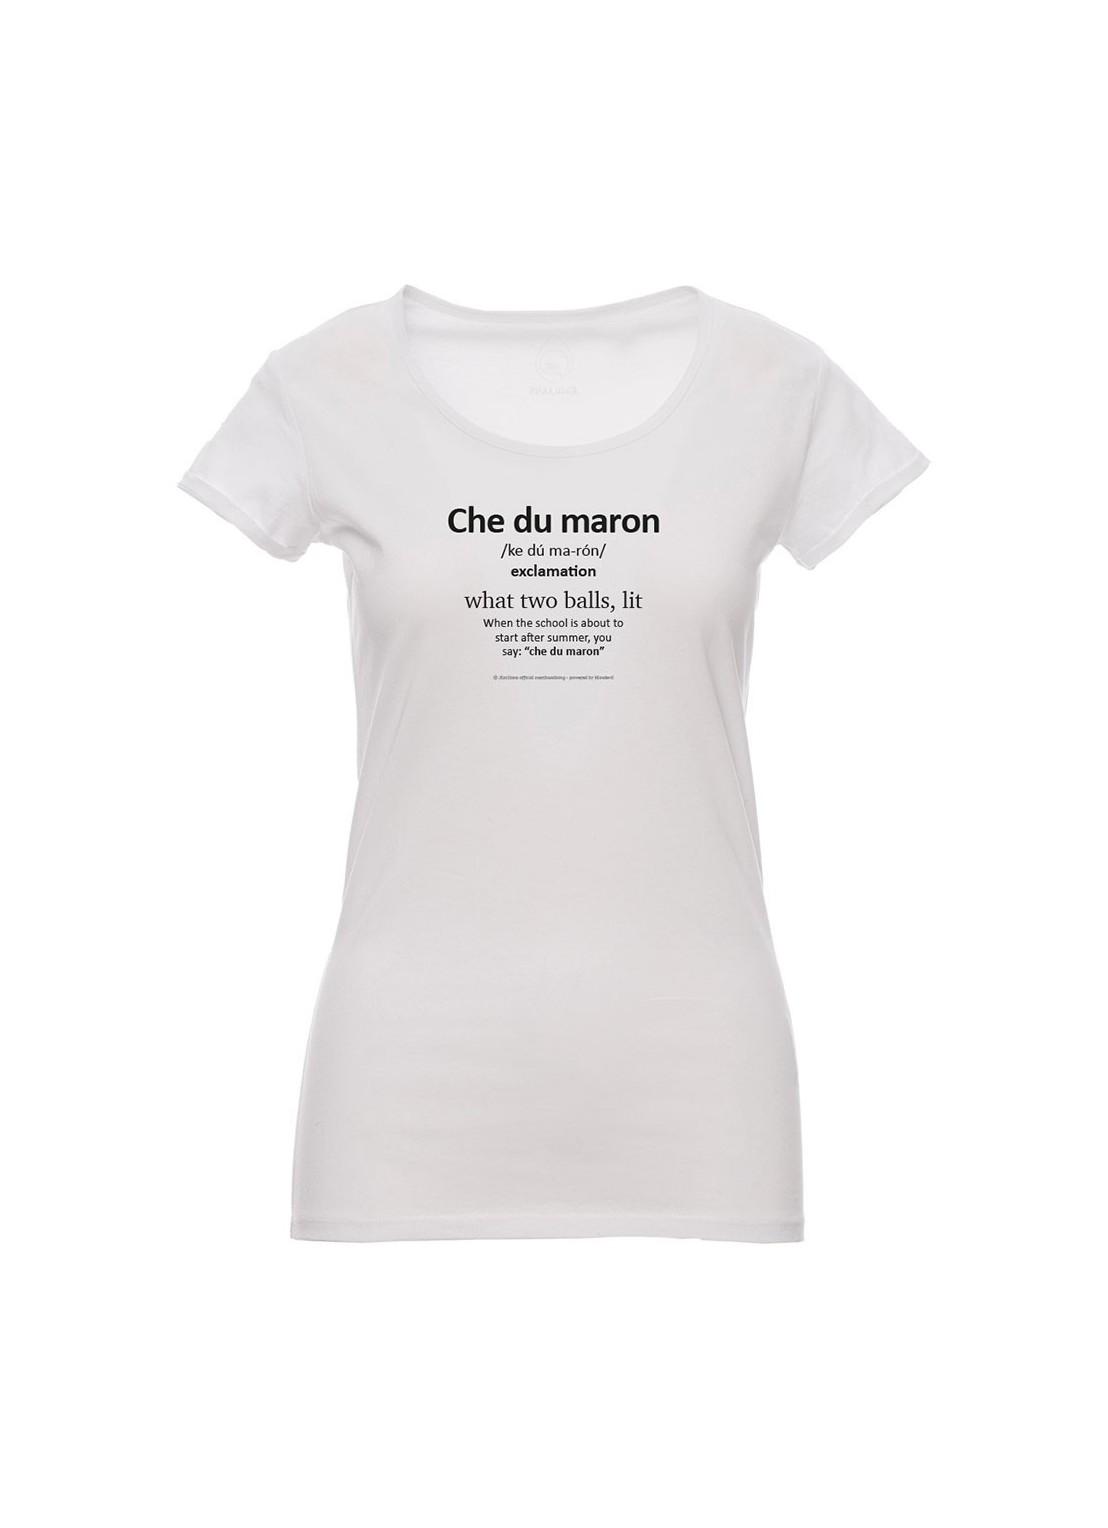 a96ba6822f t-shirt donna Ragazza Magica - nera - Maxdevil Store